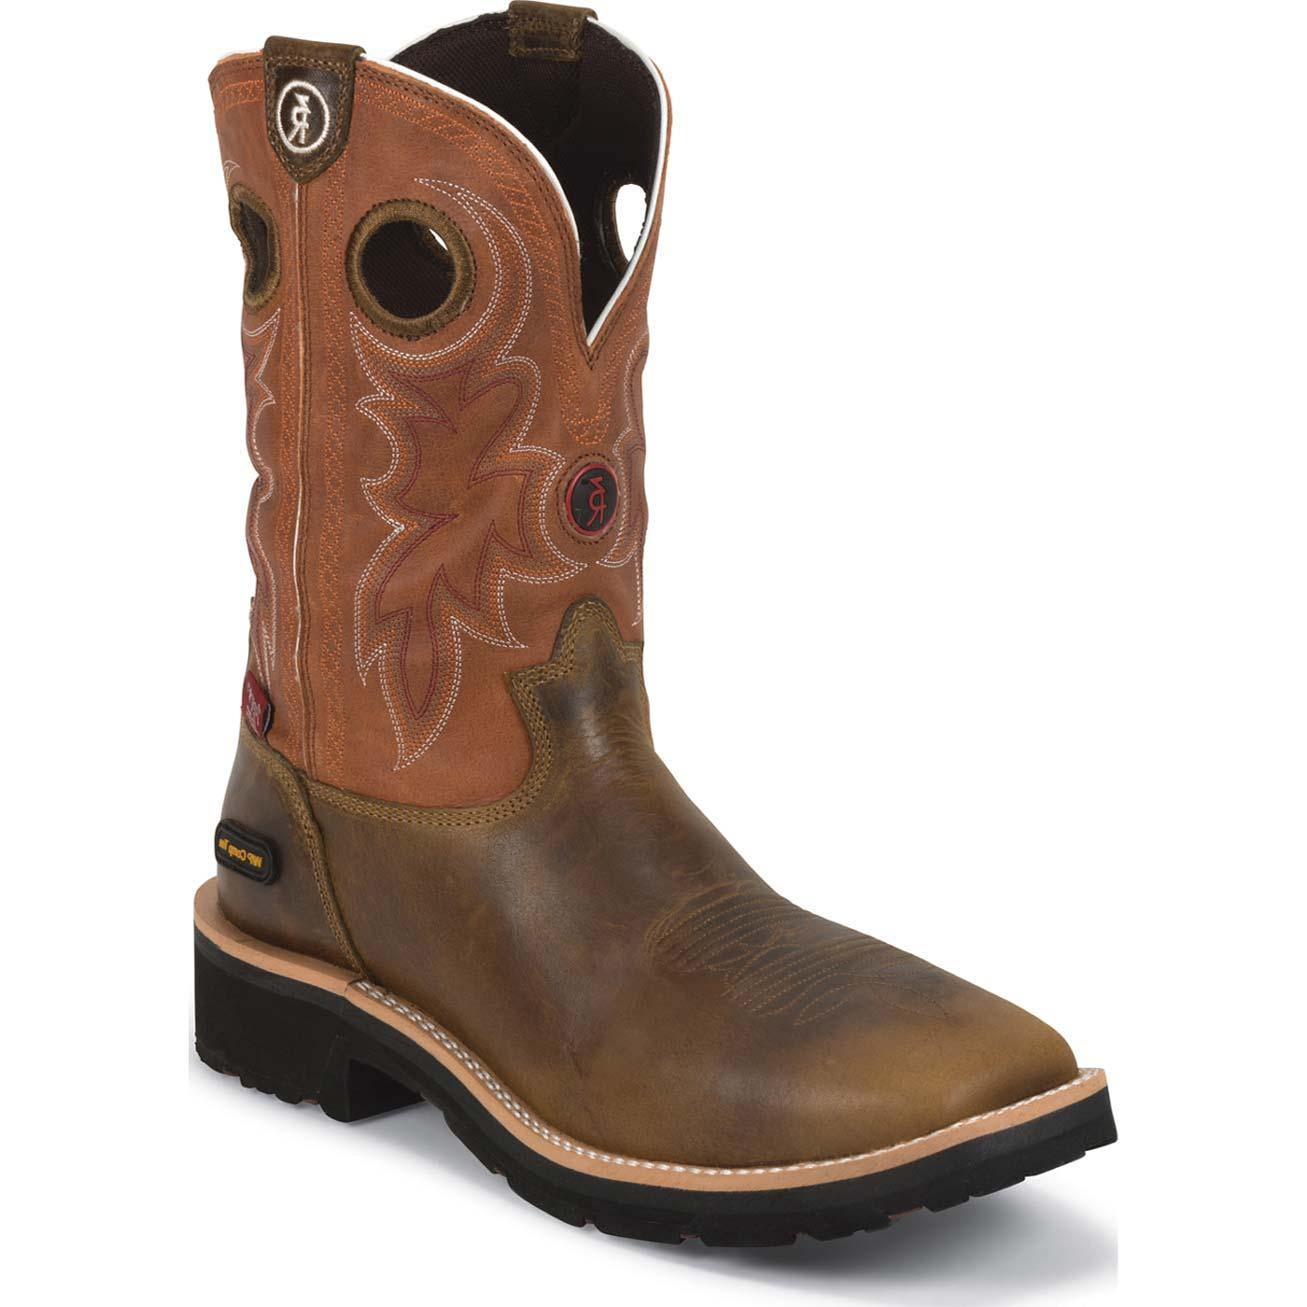 Tony Lama Composite Toe Western Waterproof Work Boots